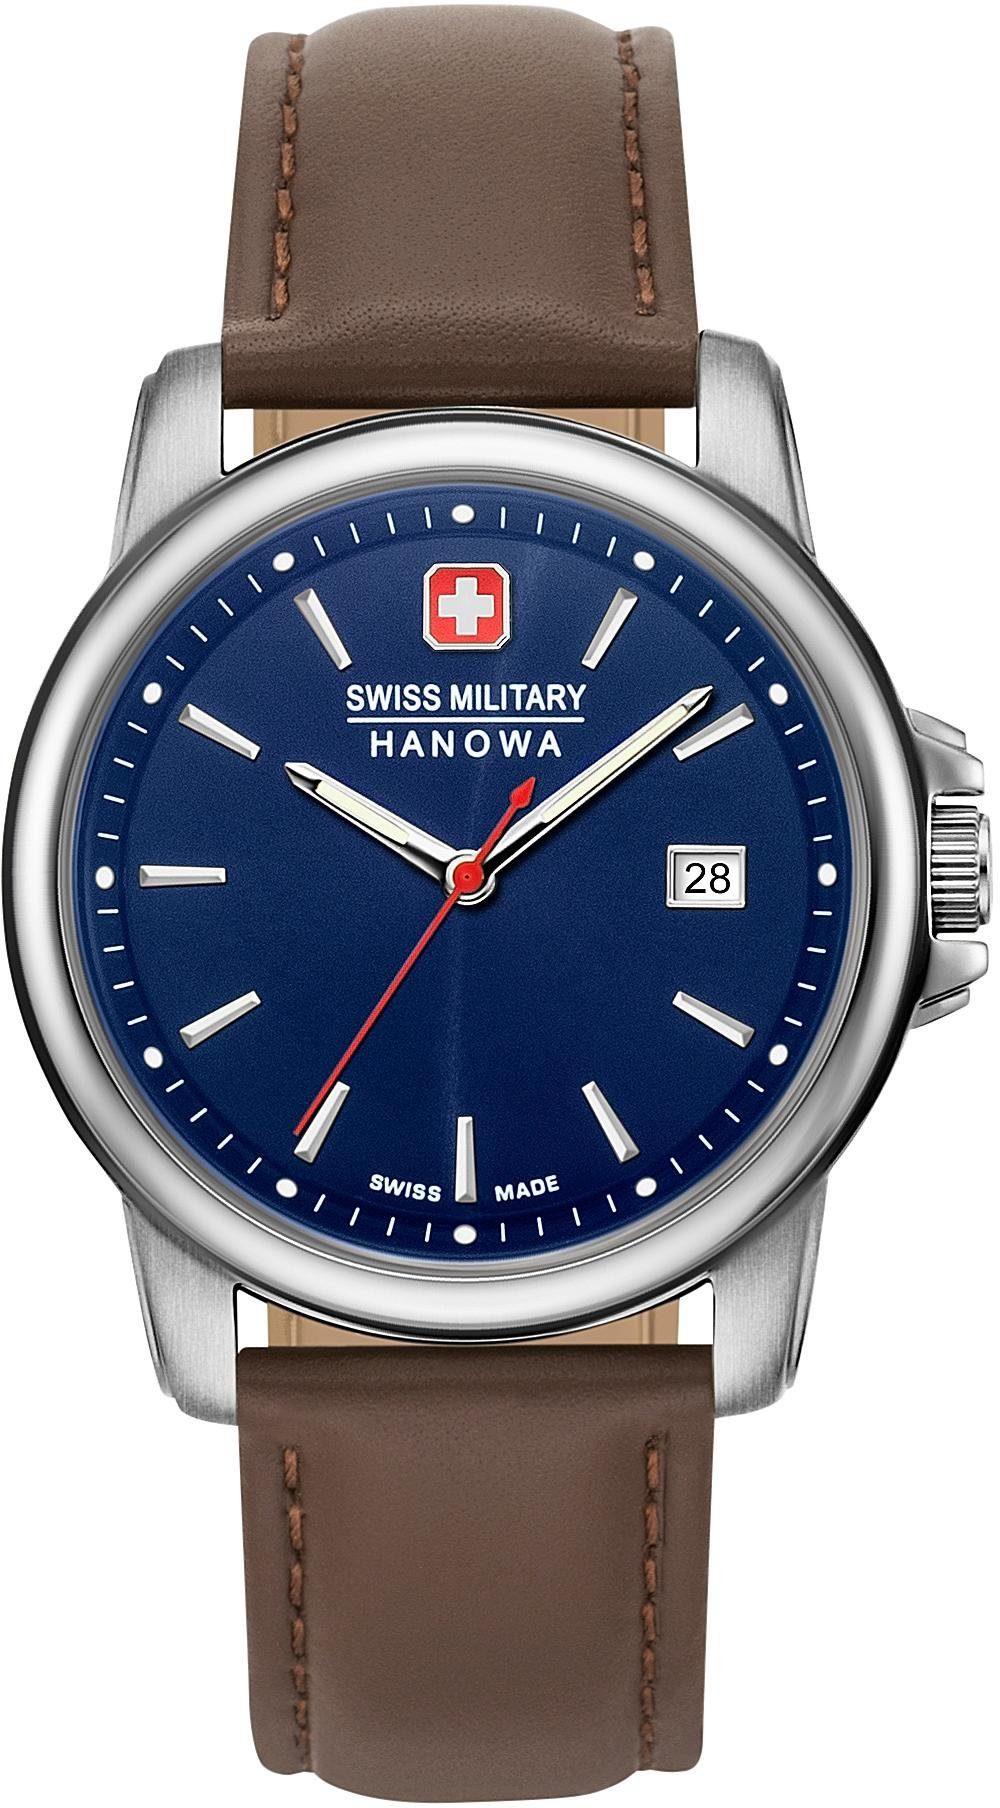 Swiss Military Hanowa Schweizer Uhr SWISS RECRUIT II, 06-4230.7.04.003 | Uhren > Schweizer Uhren | Swiss Military Hanowa